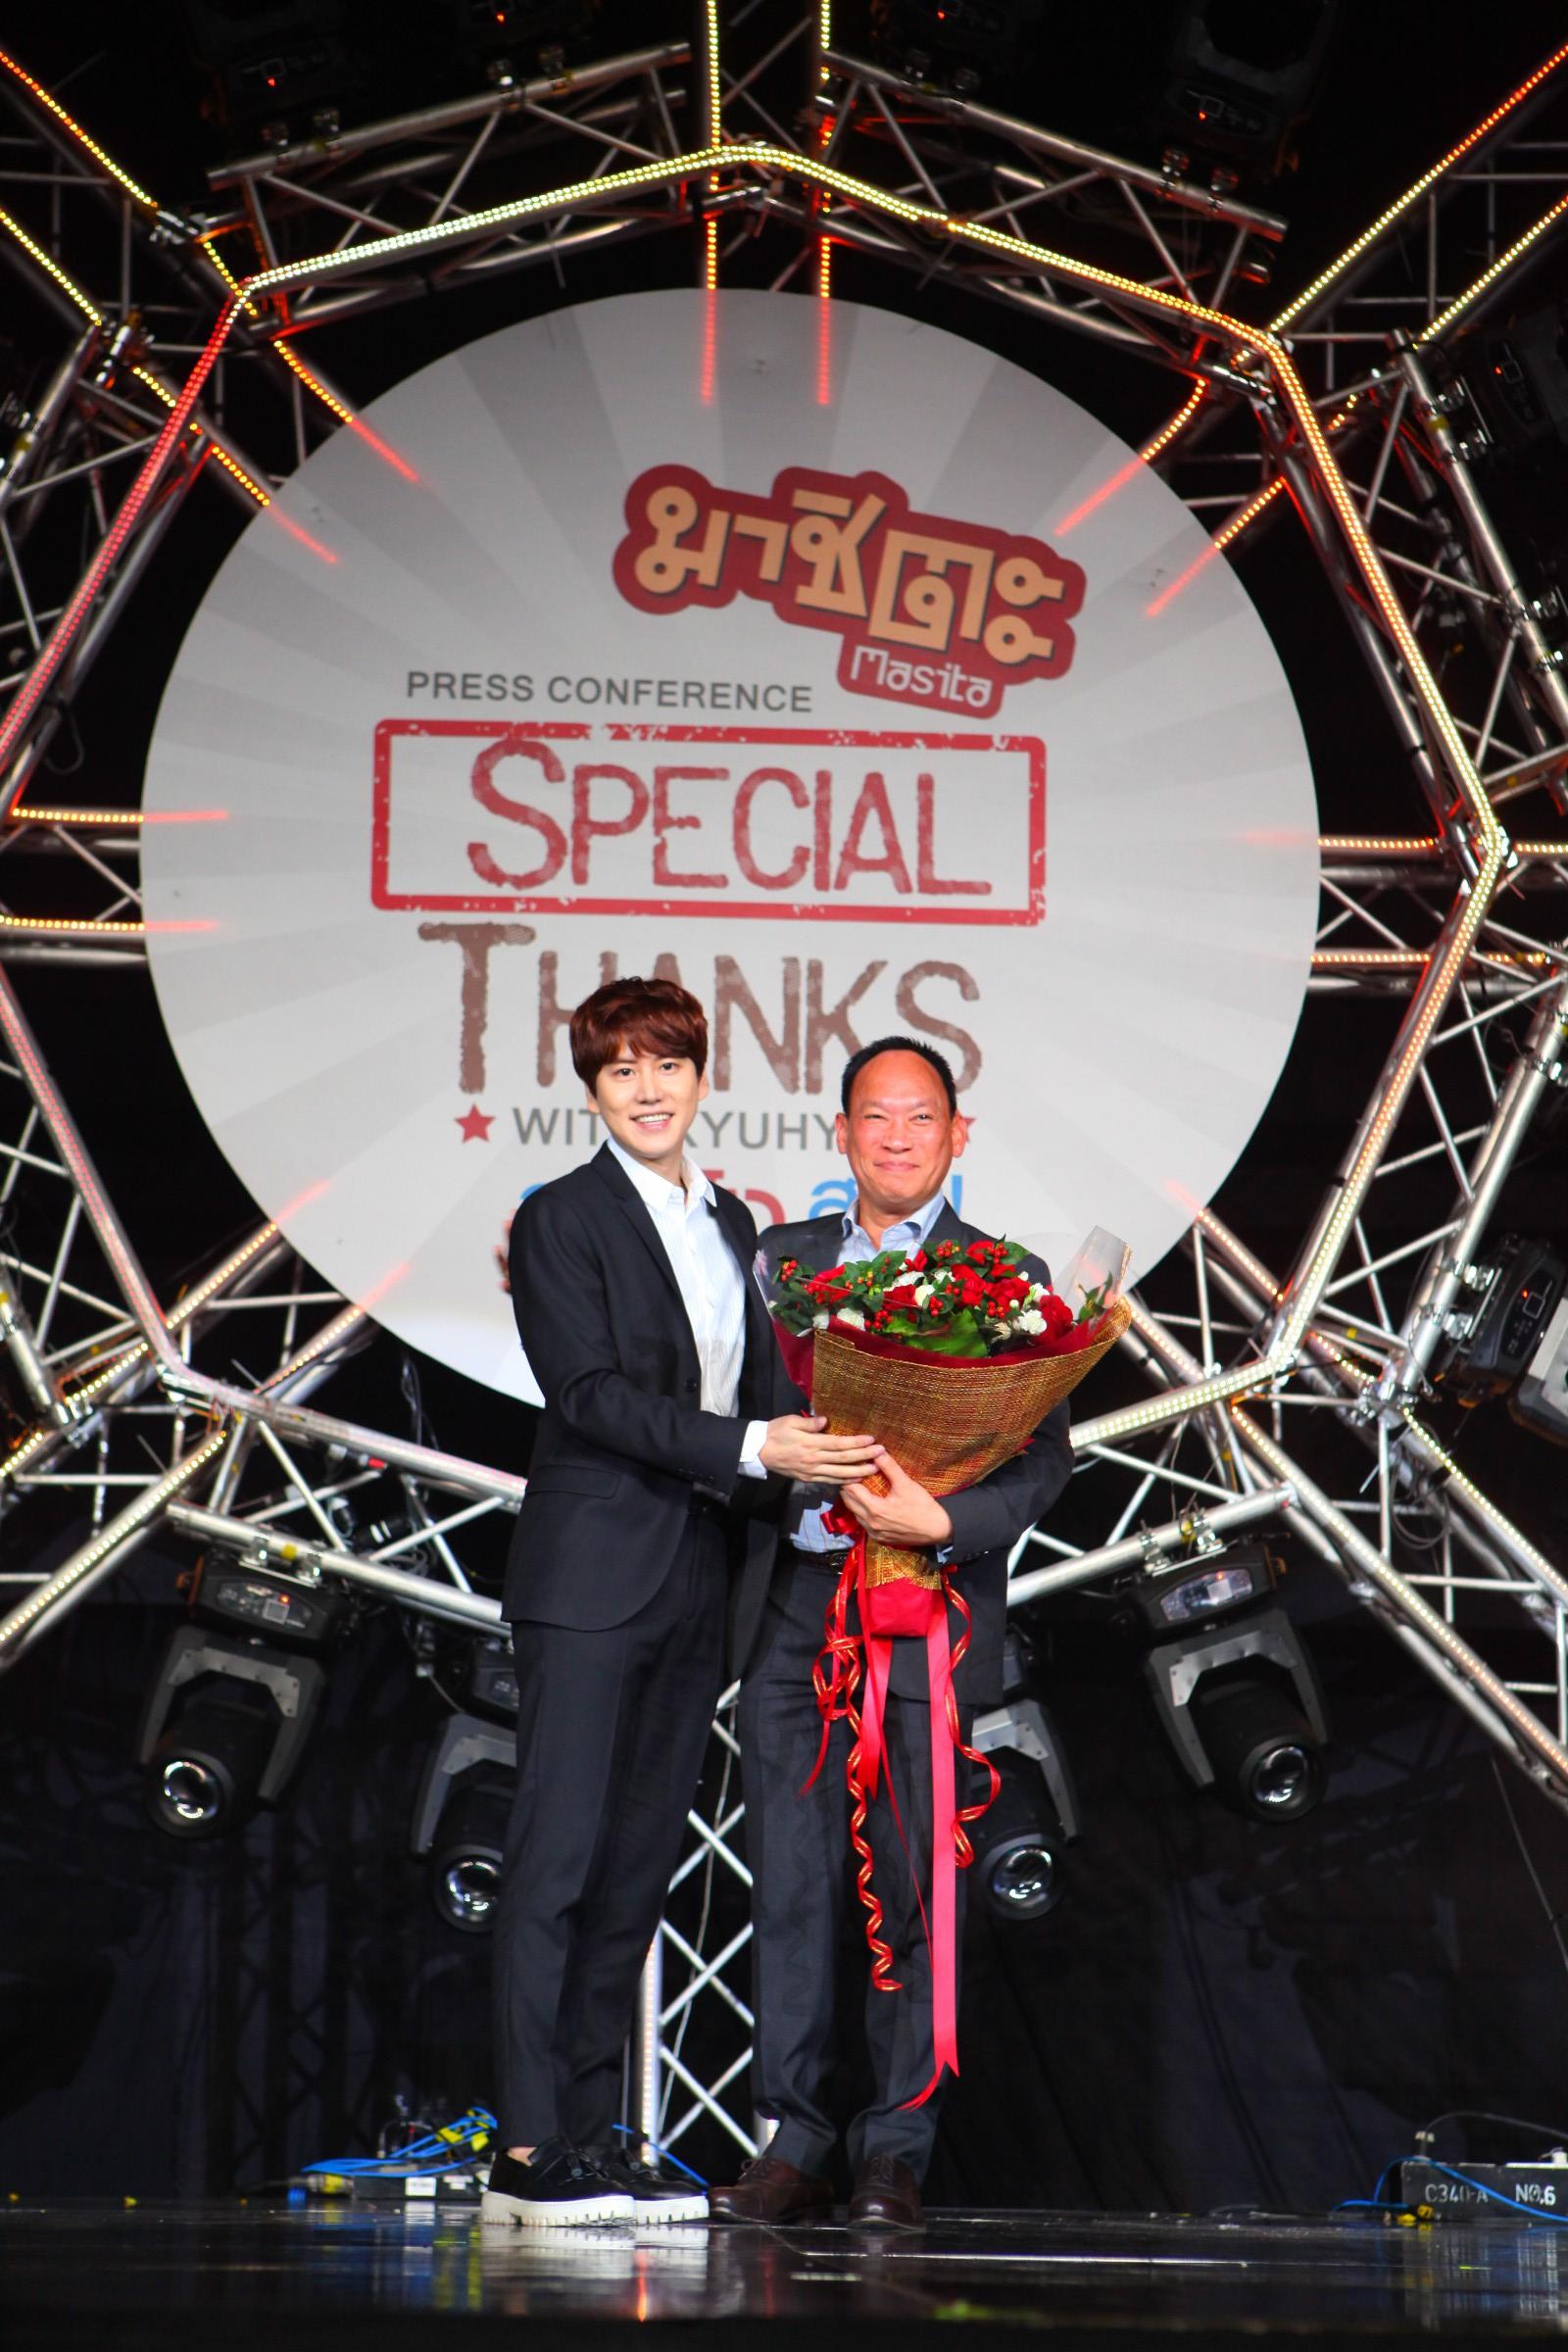 Masita Special Thanks with Kyuhyun_0548